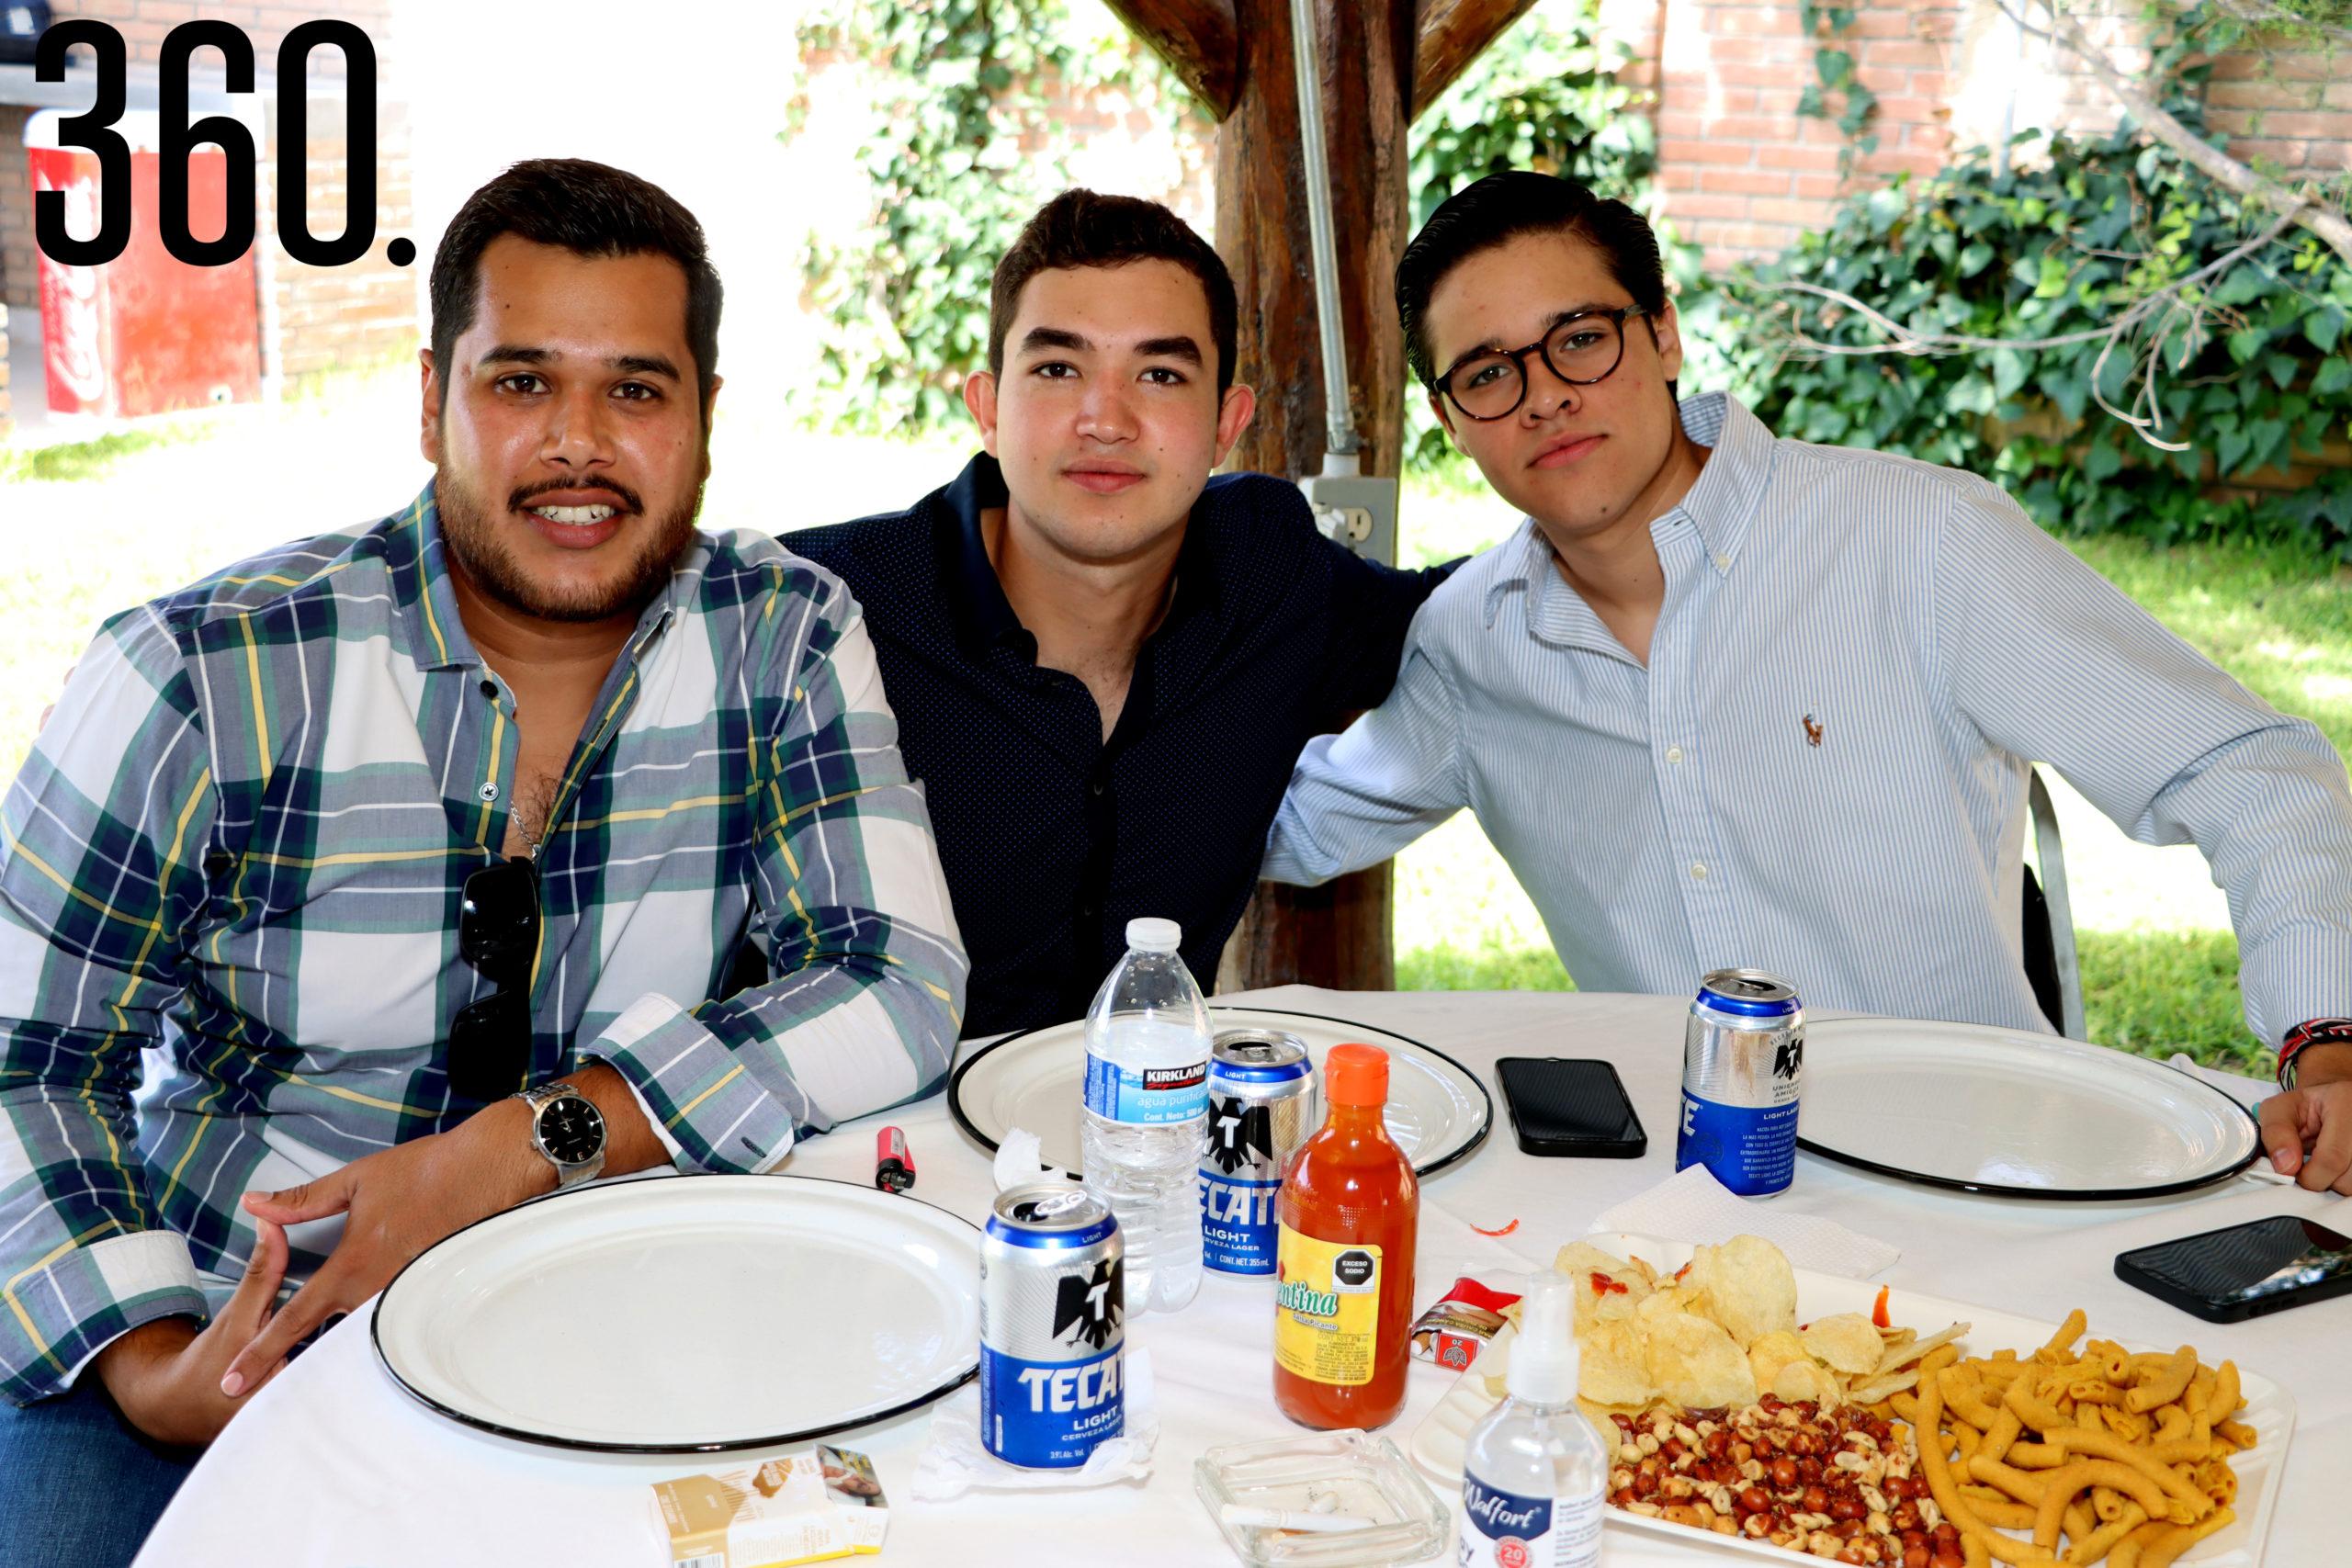 Pepe Rodríguez, Ramón Mario Oyervides y Rodrigo Sánchez.